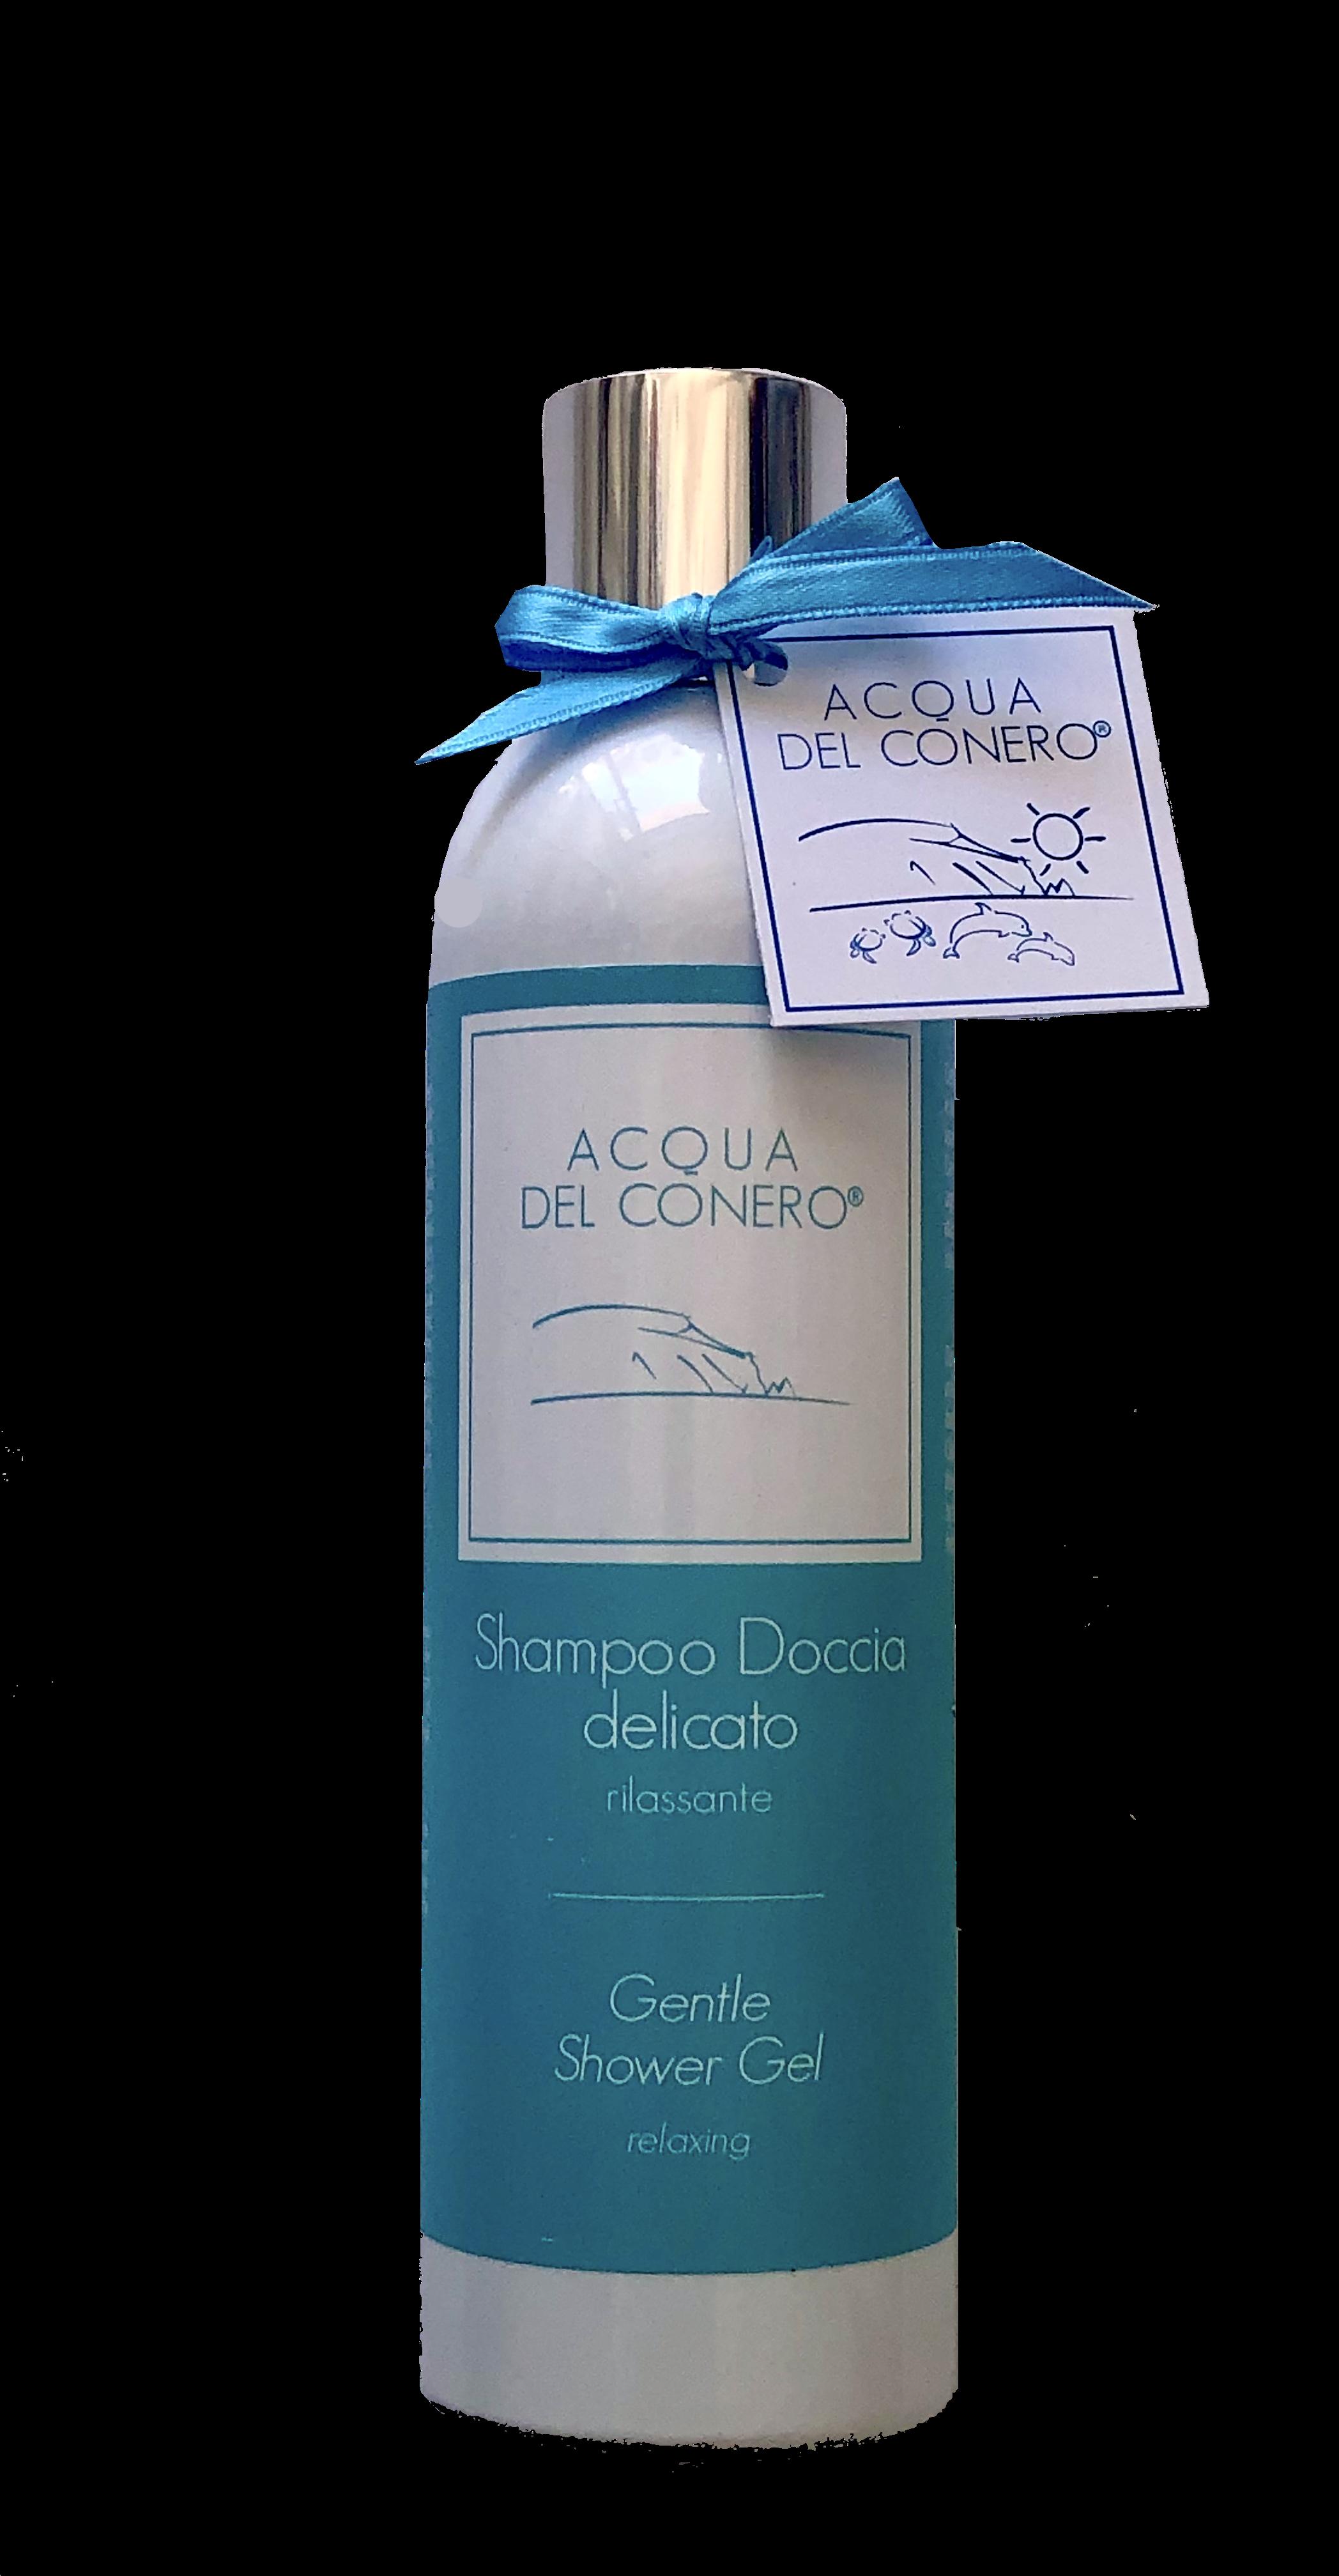 Shampoo Doccia 250 ml